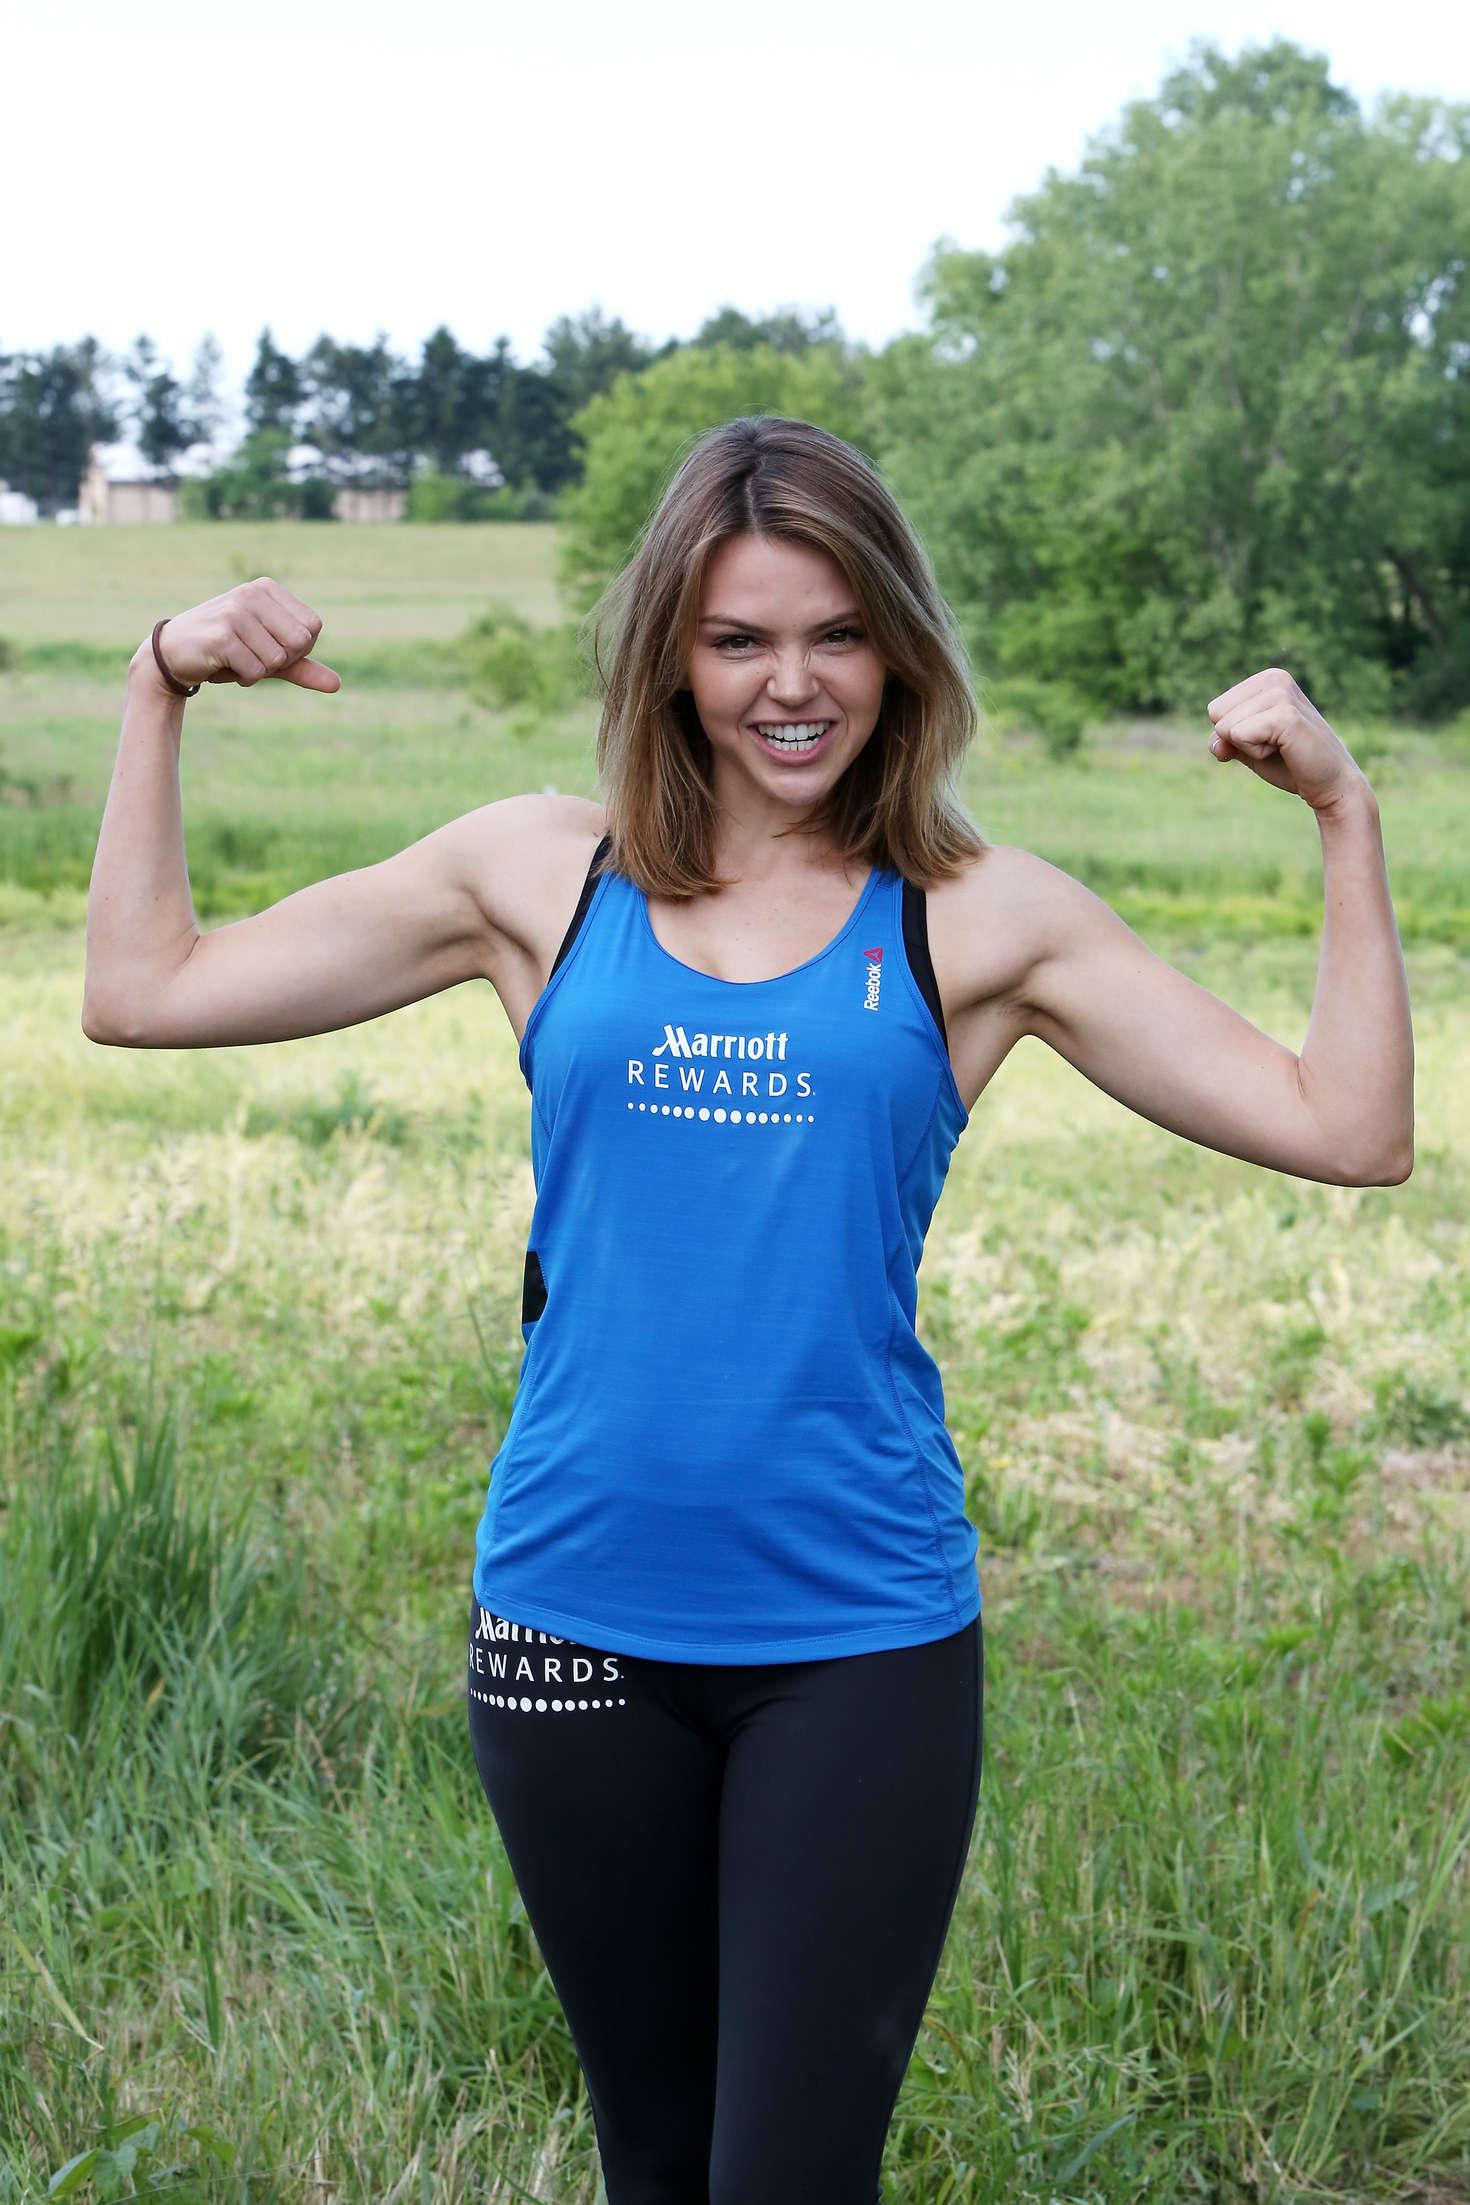 Aimee Teegarden 2016 : Aimee Teegarden: Competing in the Spartan Super Race -03